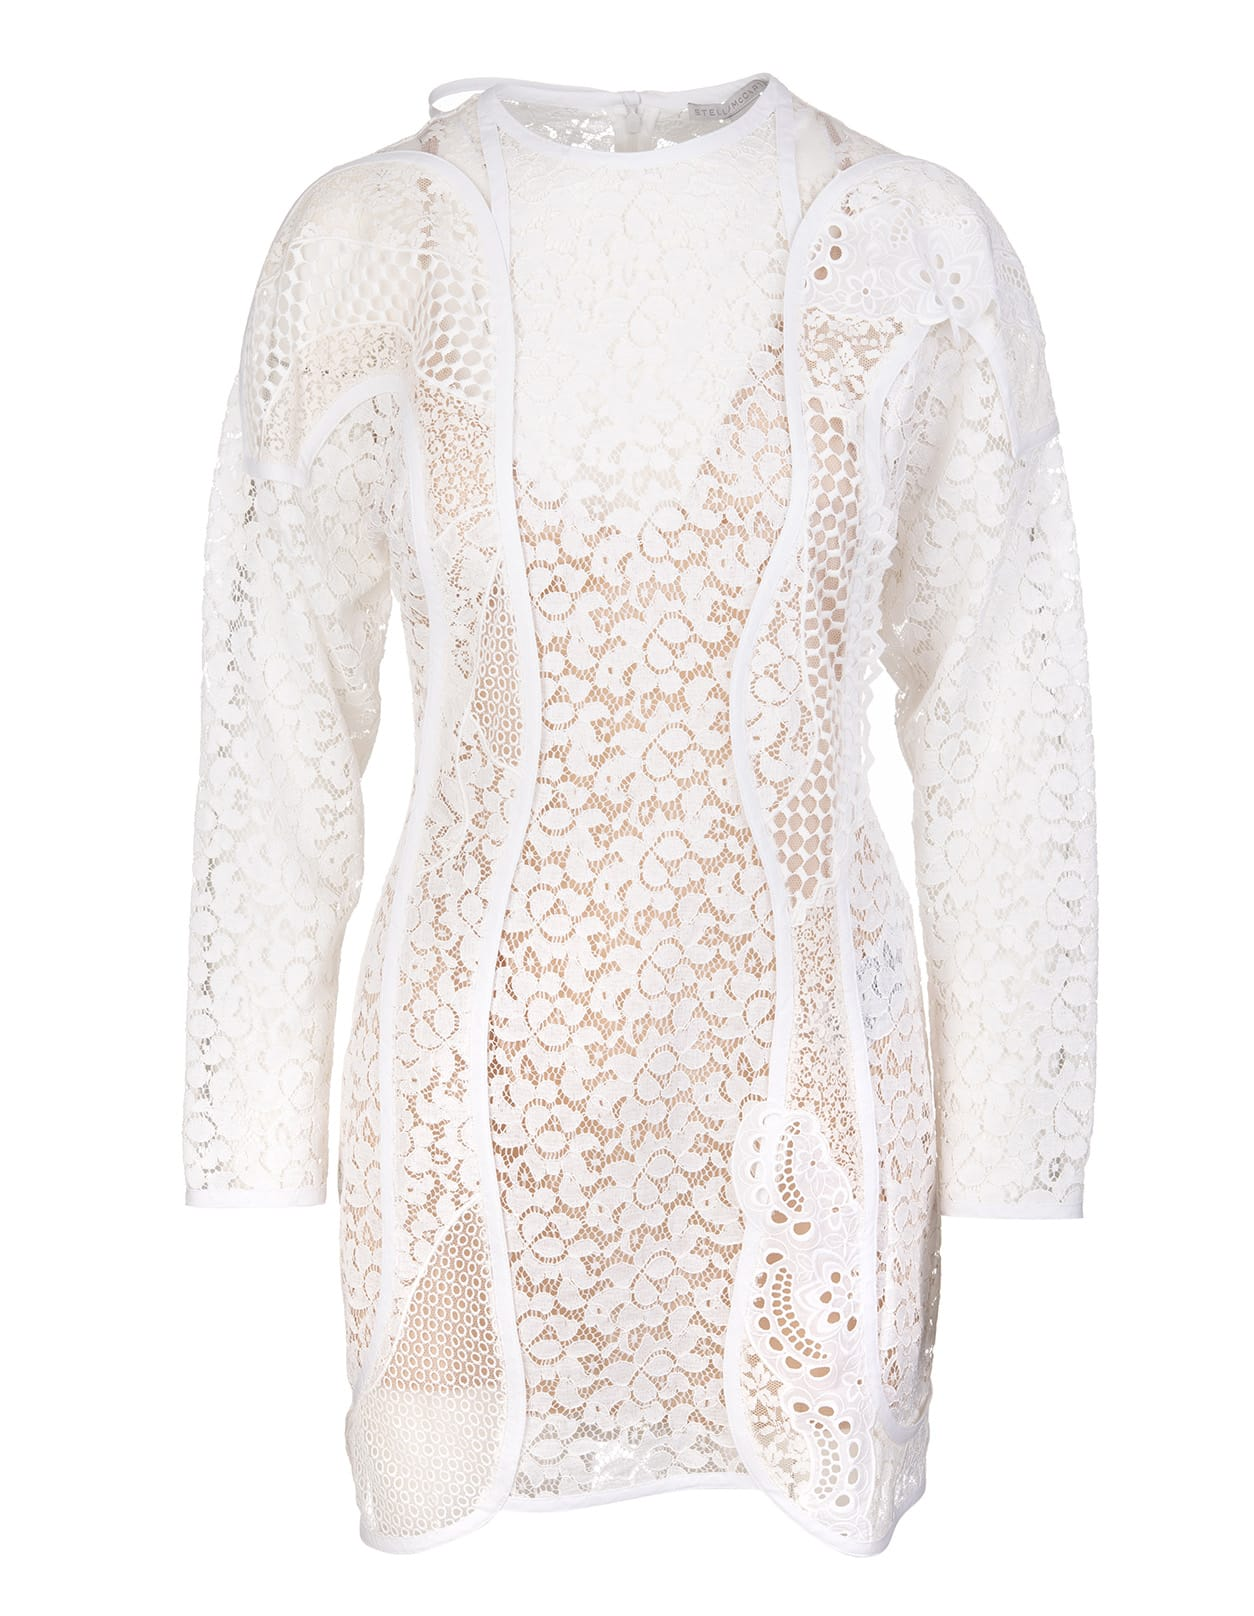 Stella McCartney Cream Daphne Minidress